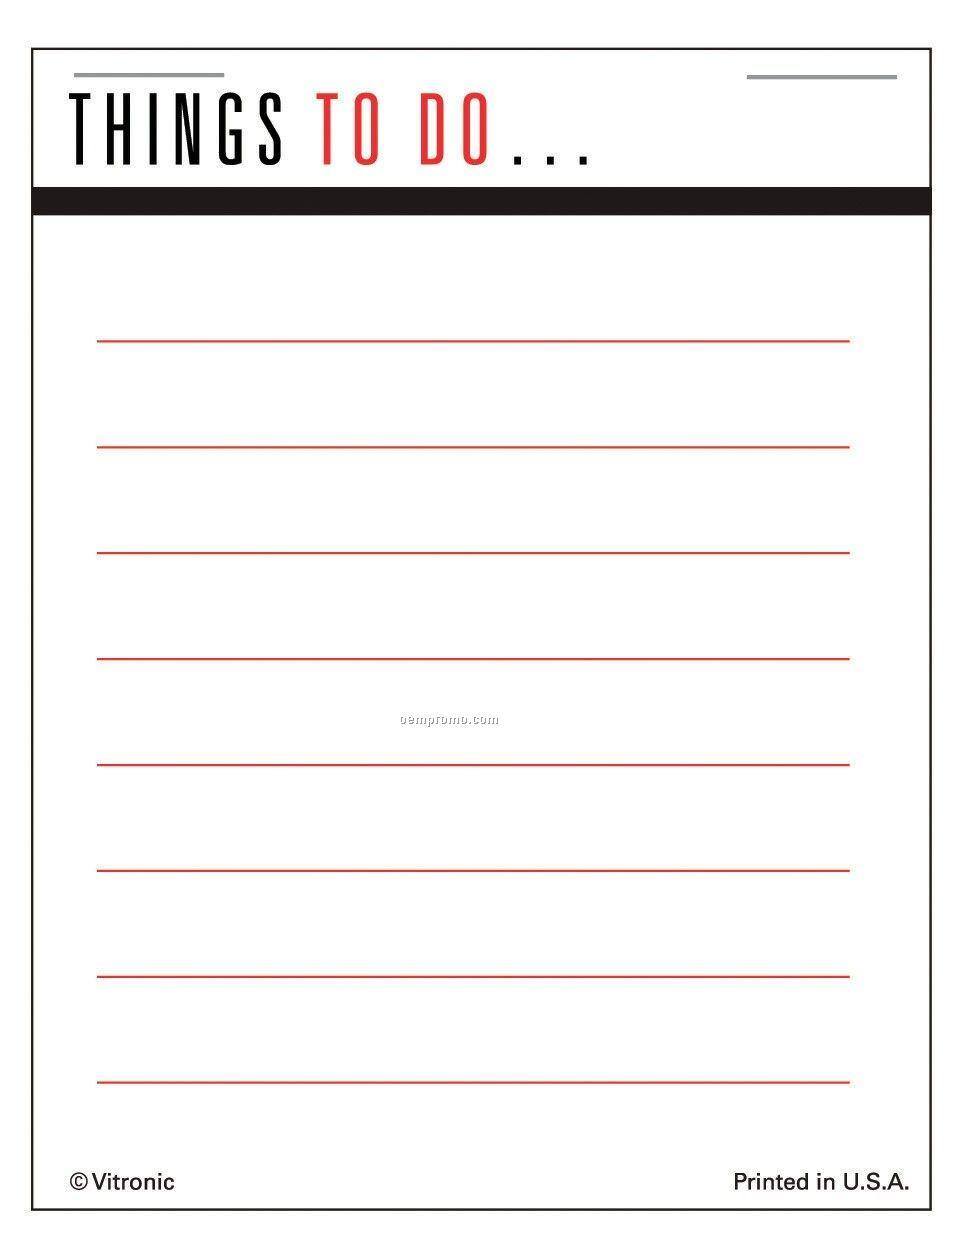 Super Size Things To Do List Press-n-stick Calendar Pads (Thru 8/1/11)